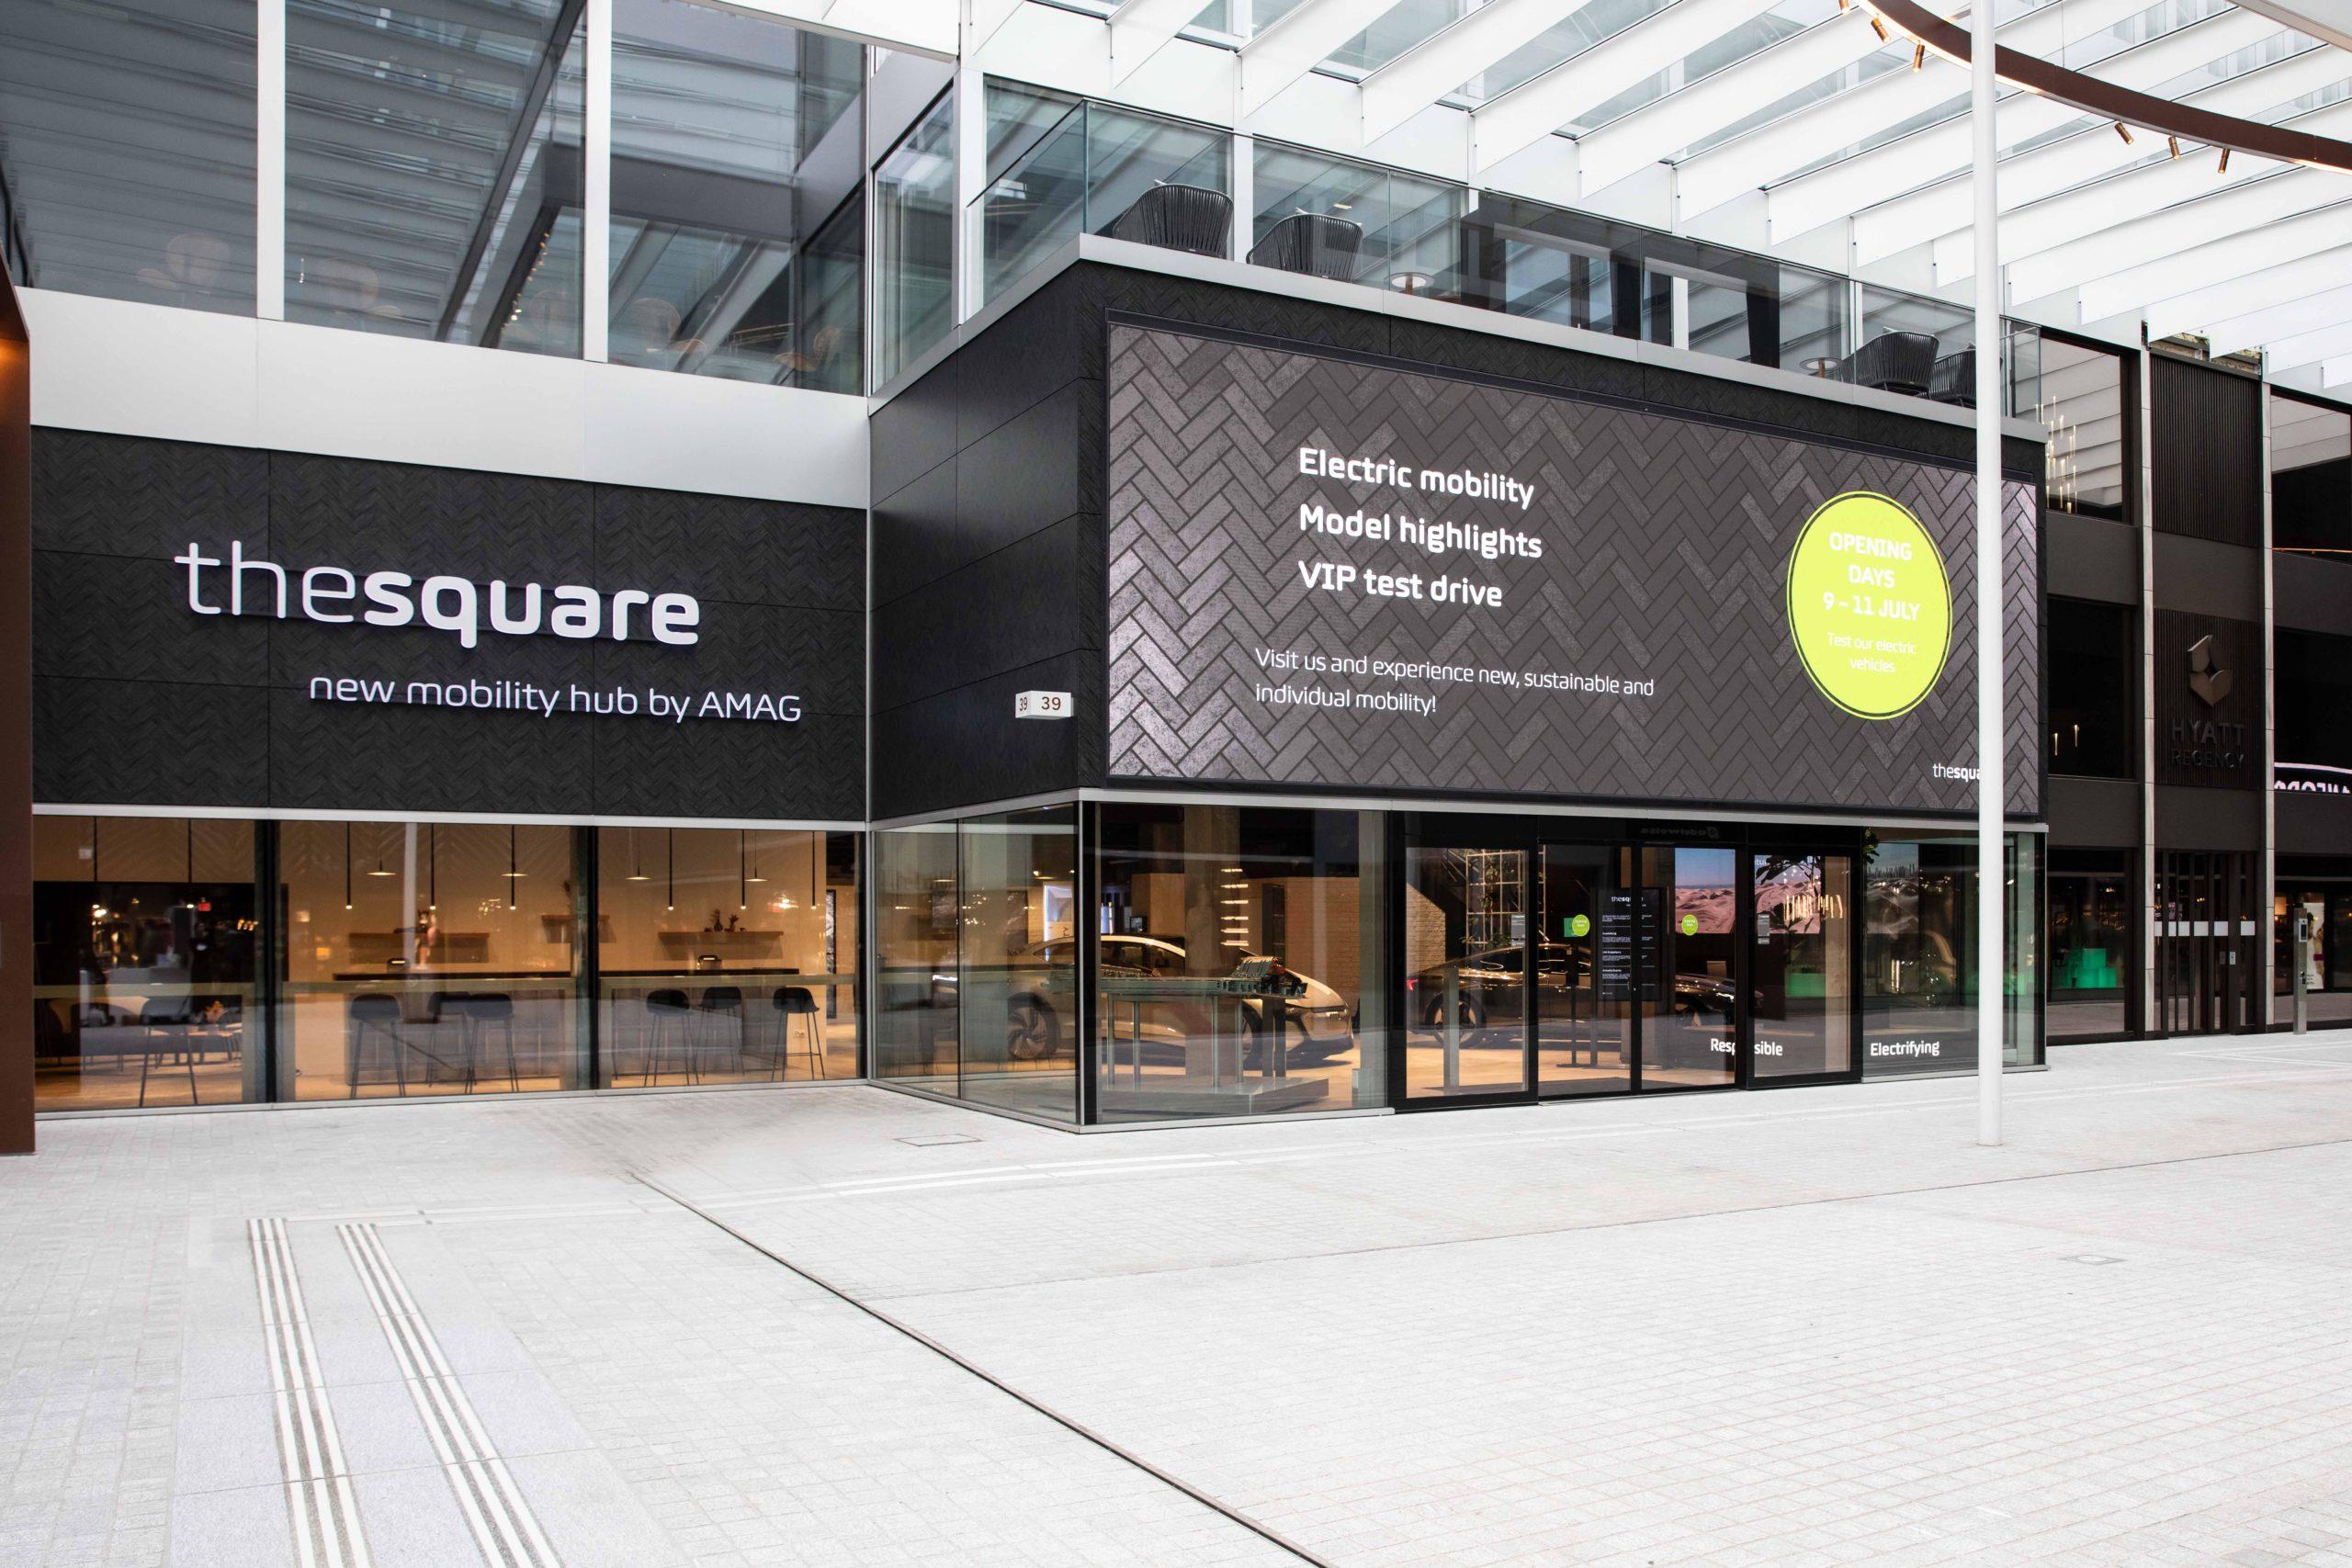 the square (Fotos: AMAG)